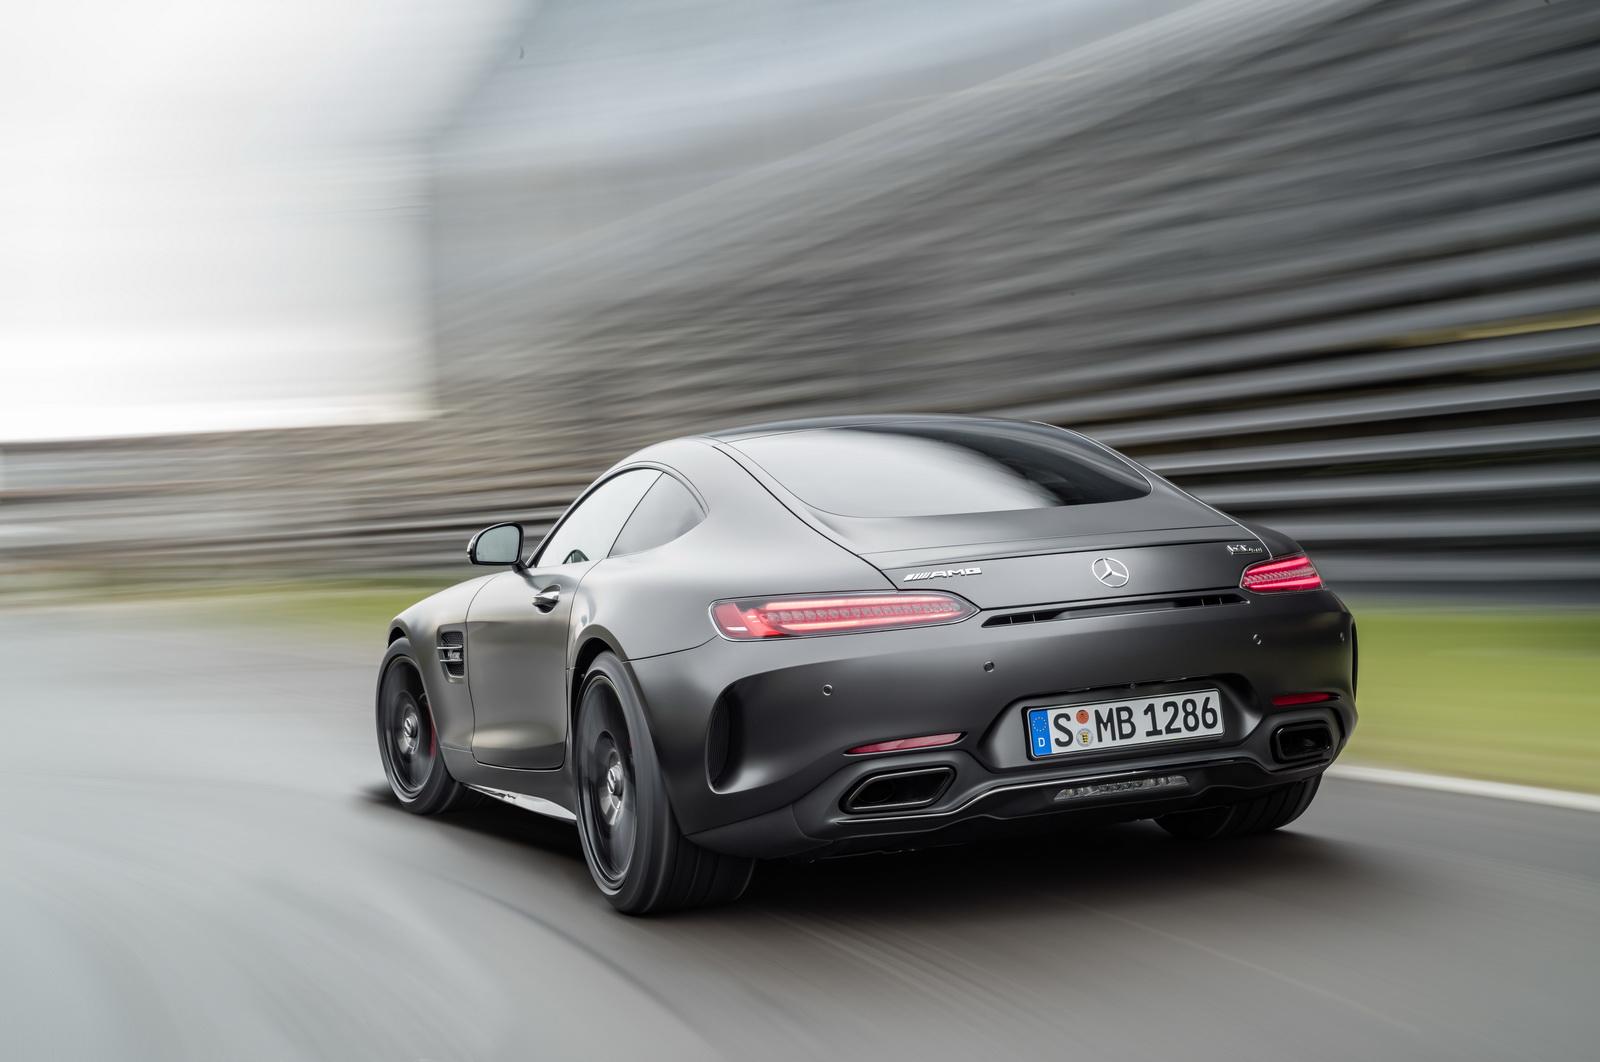 Mercedes-AMG GT C Edition 50, graphitgrau magno, Fahraufnahme ;Kraftstoffverbrauch kombiniert: 11,3 l/100 km, CO2-Emissionen kombiniert: 257 g/kmMercedes-AMG GT C Edition 50, graphite grey magno, driving shot; Fuel consumption combined:  11.3 l/100 km; Combined CO2 emissions: 257 g/km